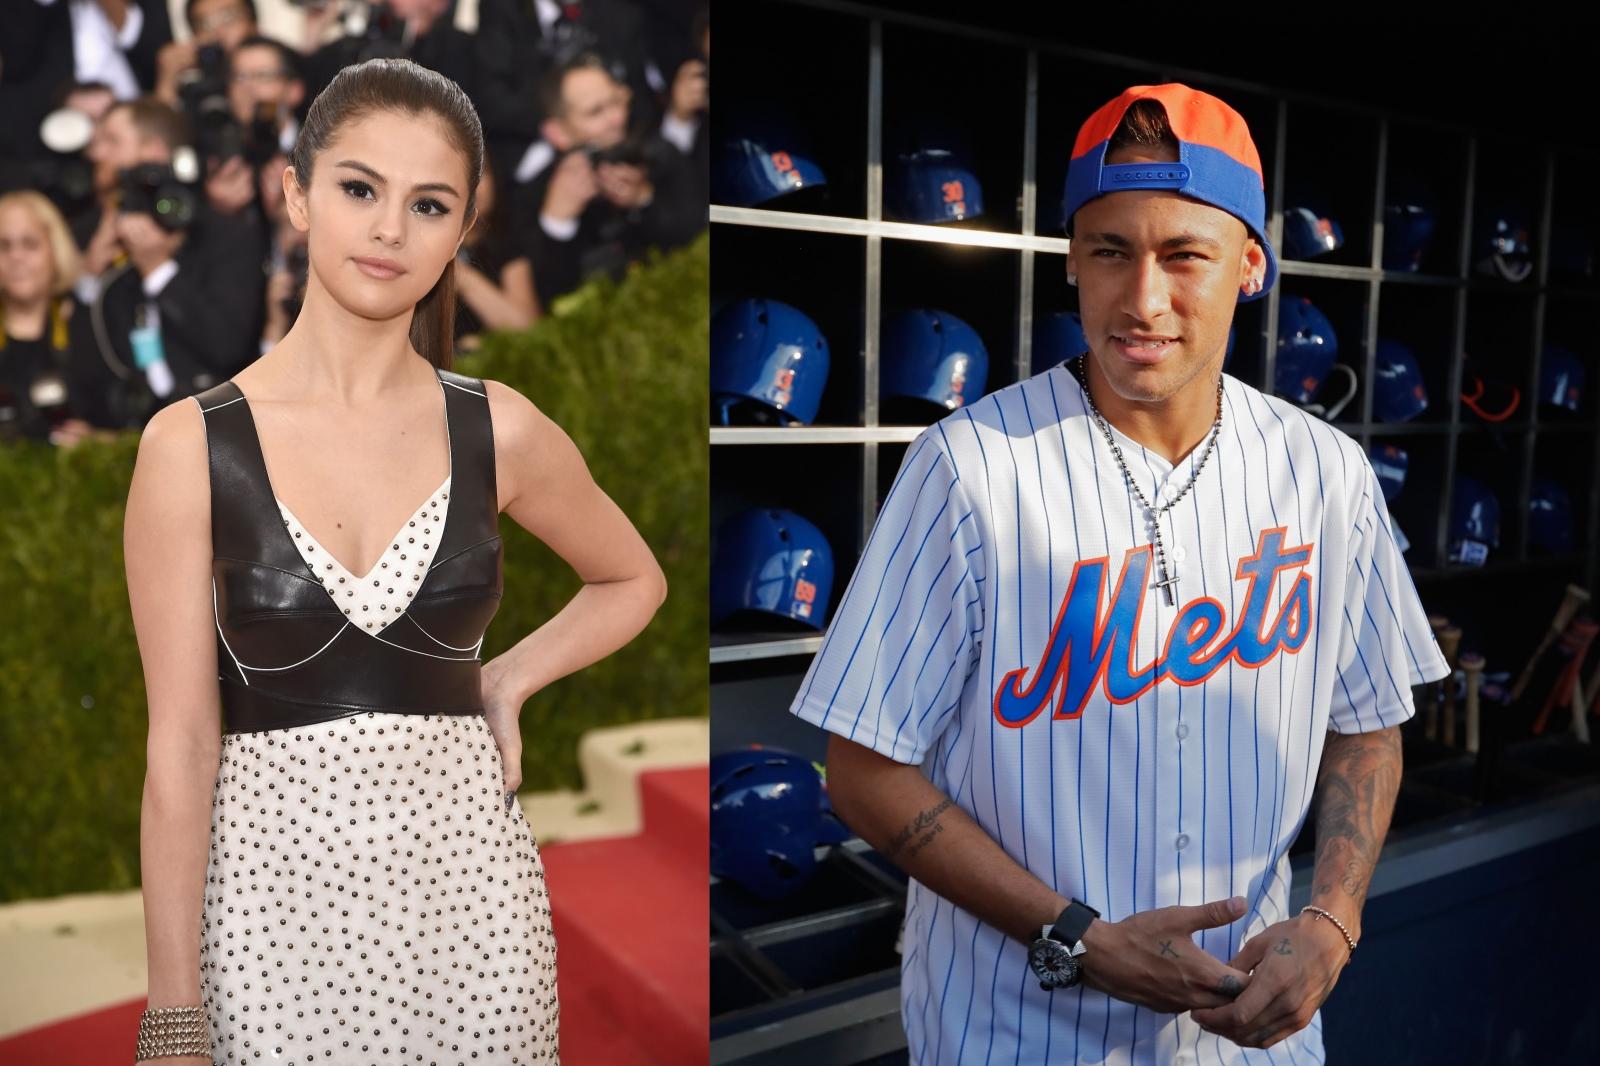 Selena Gomez and Neymar